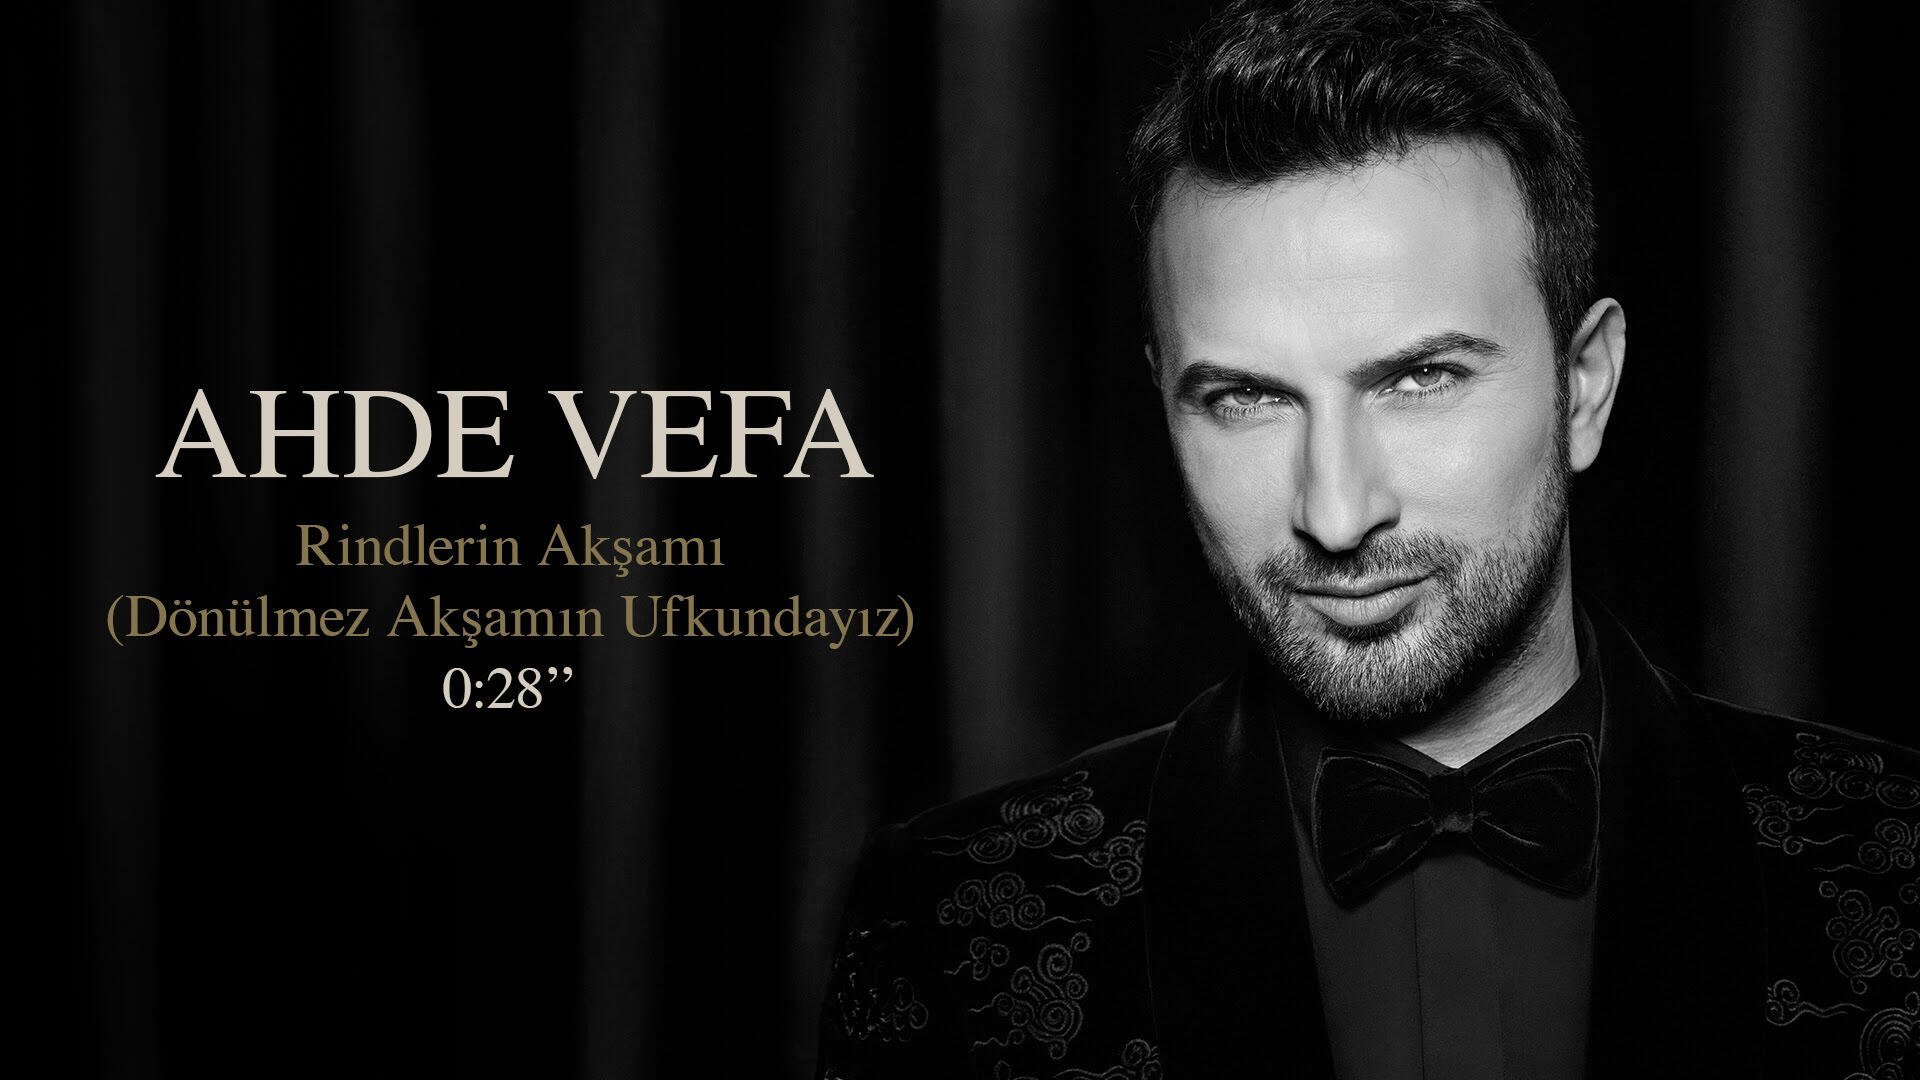 Tarkan Ahde Vefa albümü